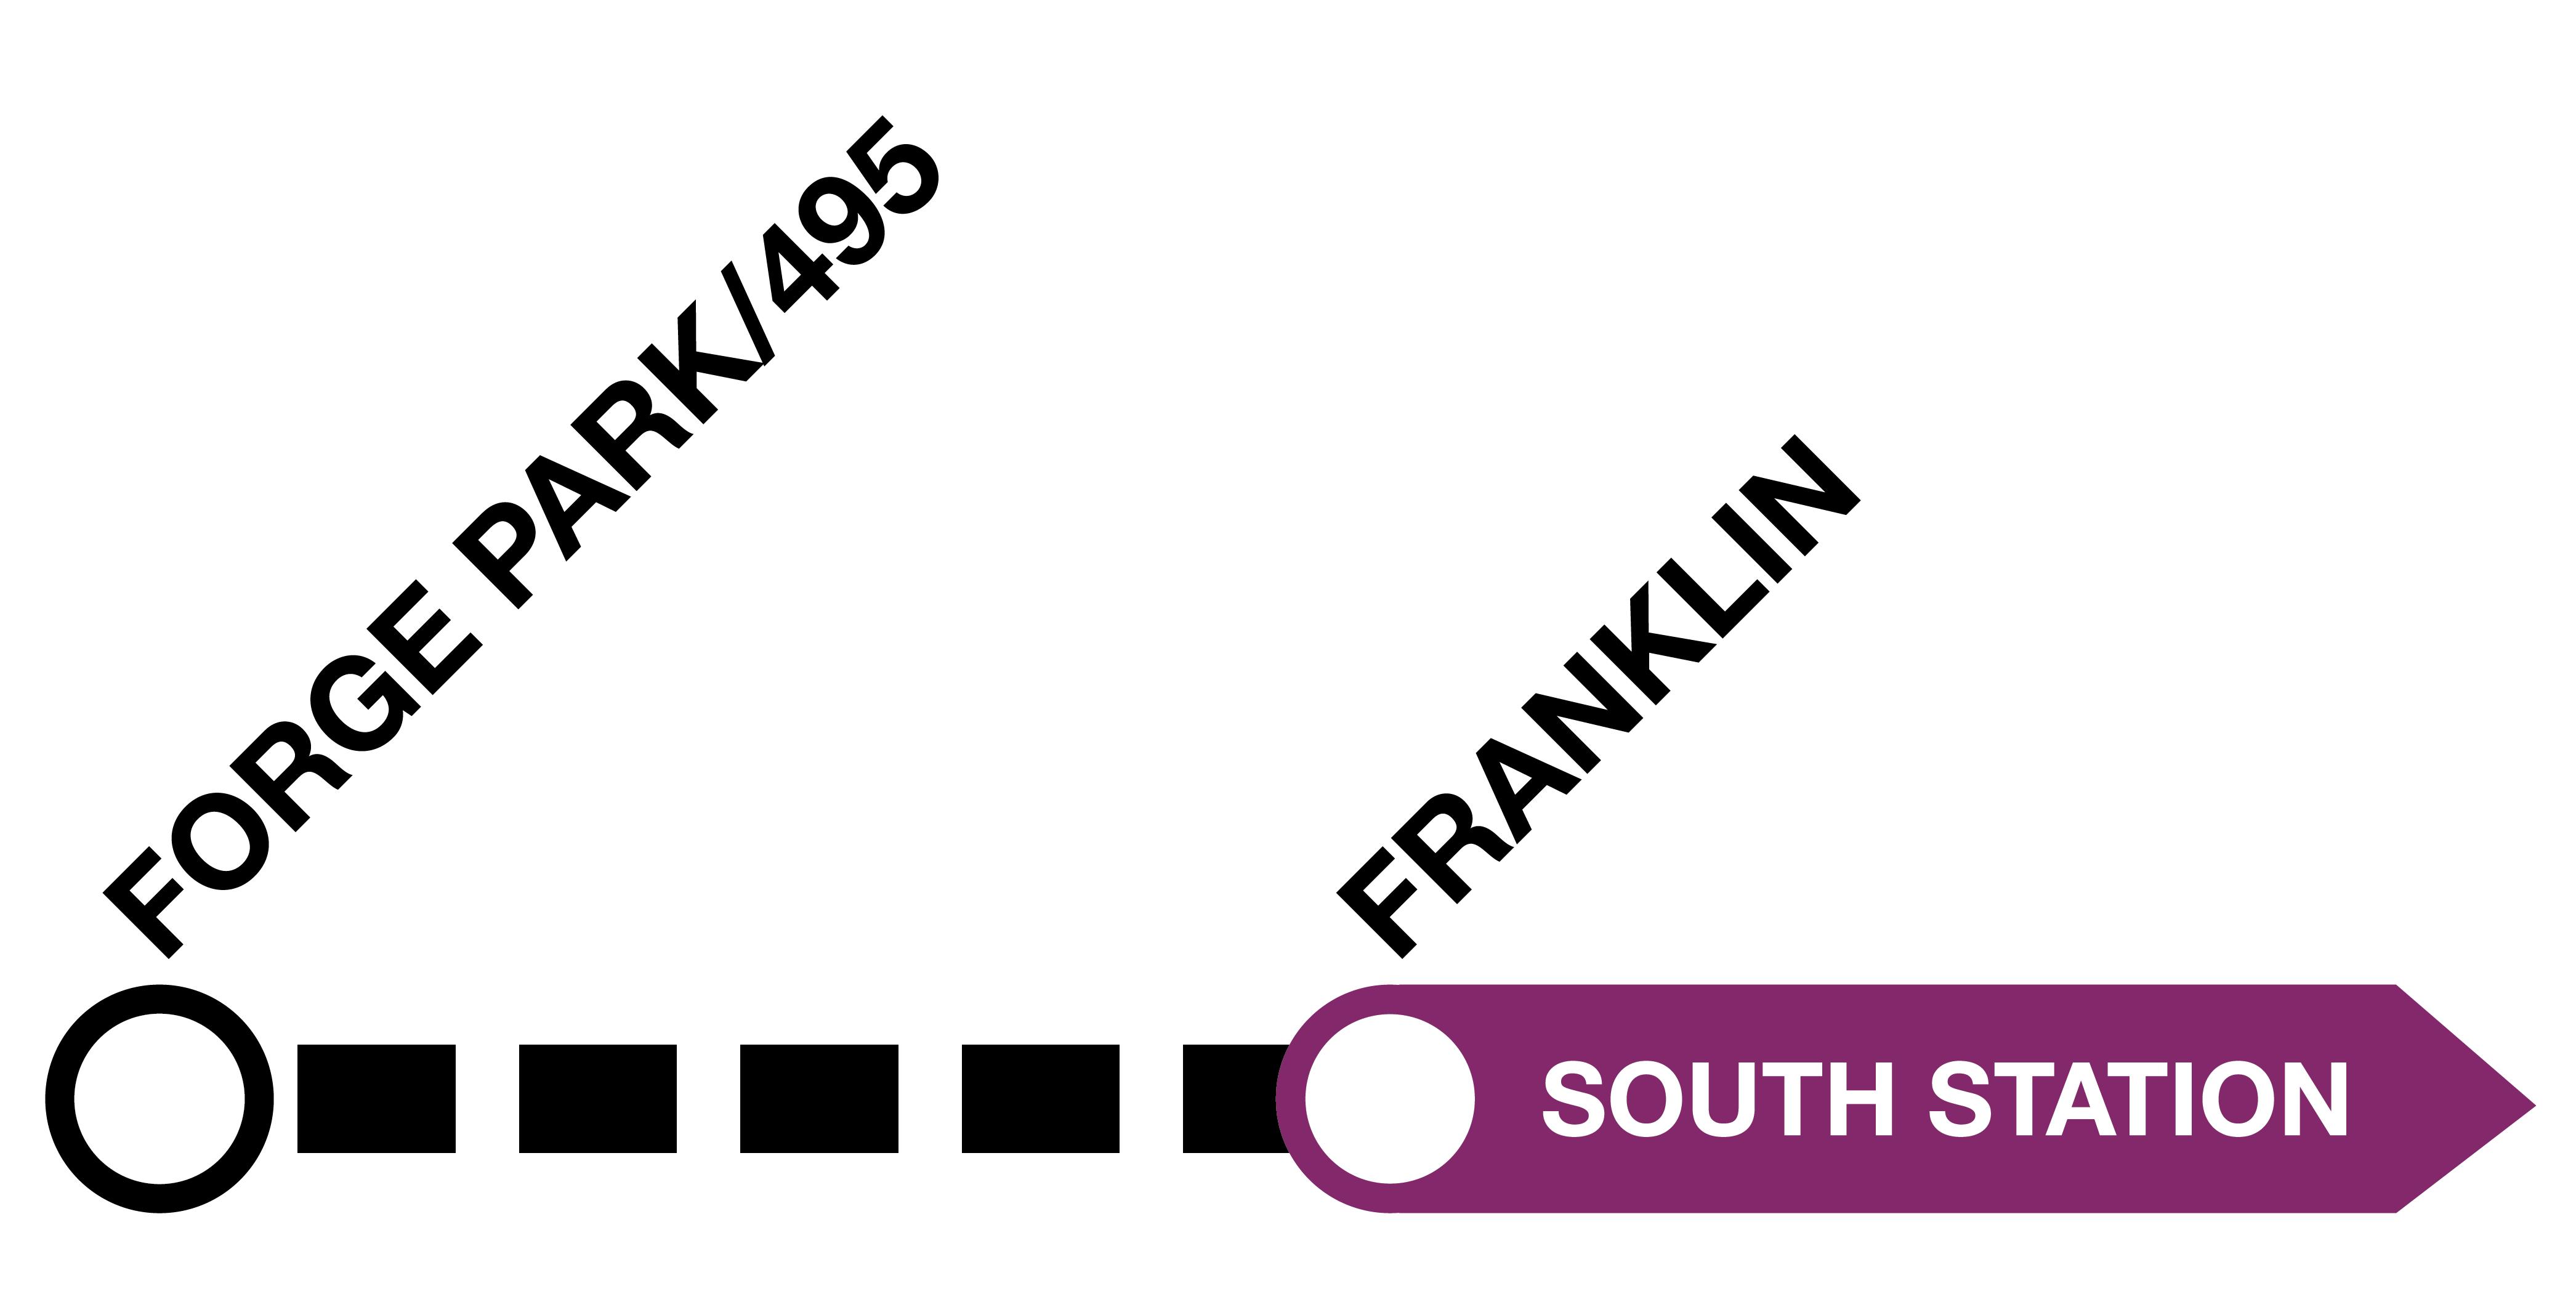 Reminder: Shuttle between Forge Park, Franklin/Dean on Weekdays - 8 AM – 3:30 PM